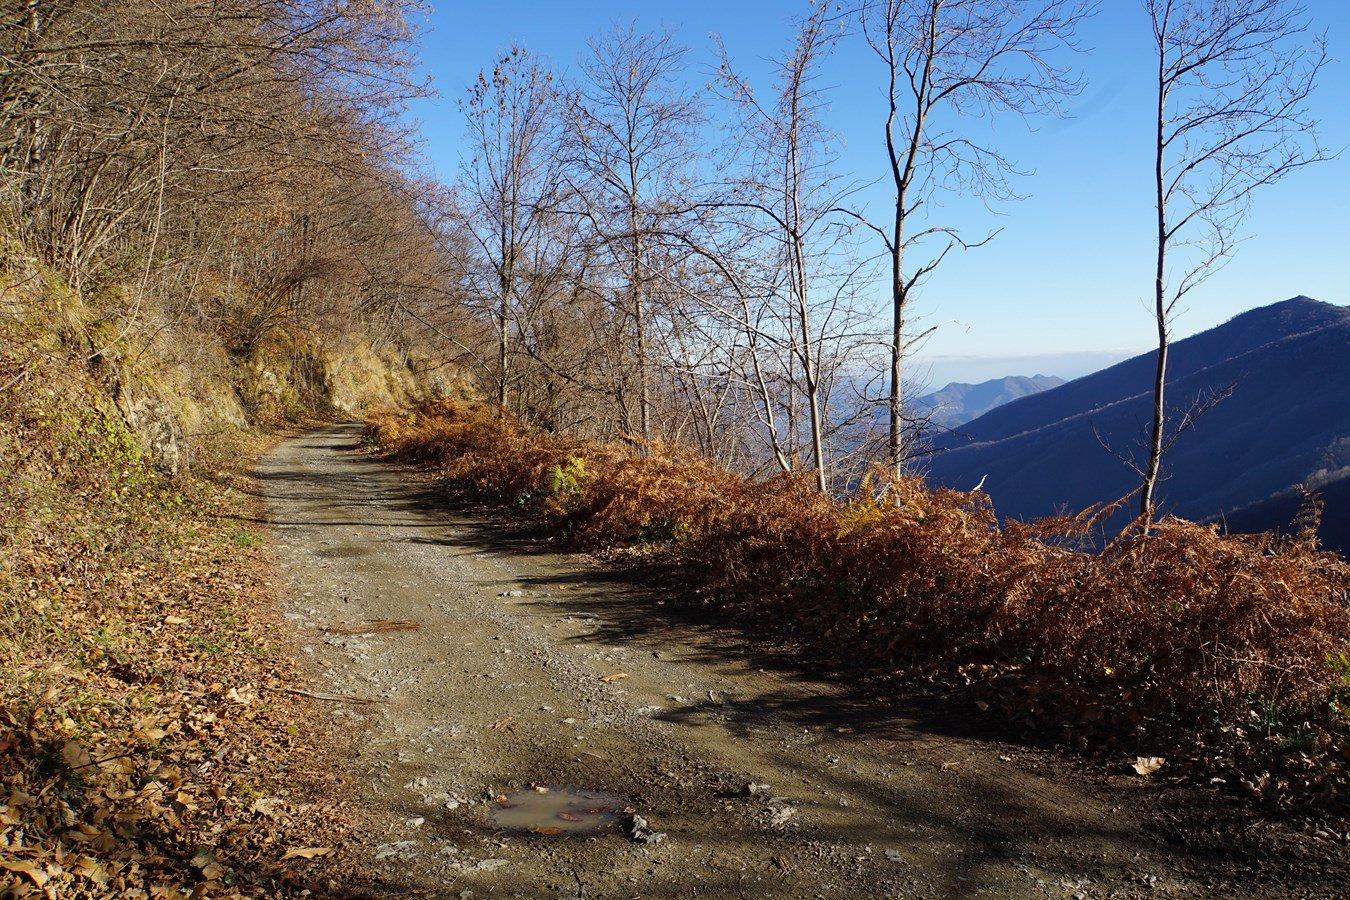 l'asfaltata diventa una bella sterrata panoramica